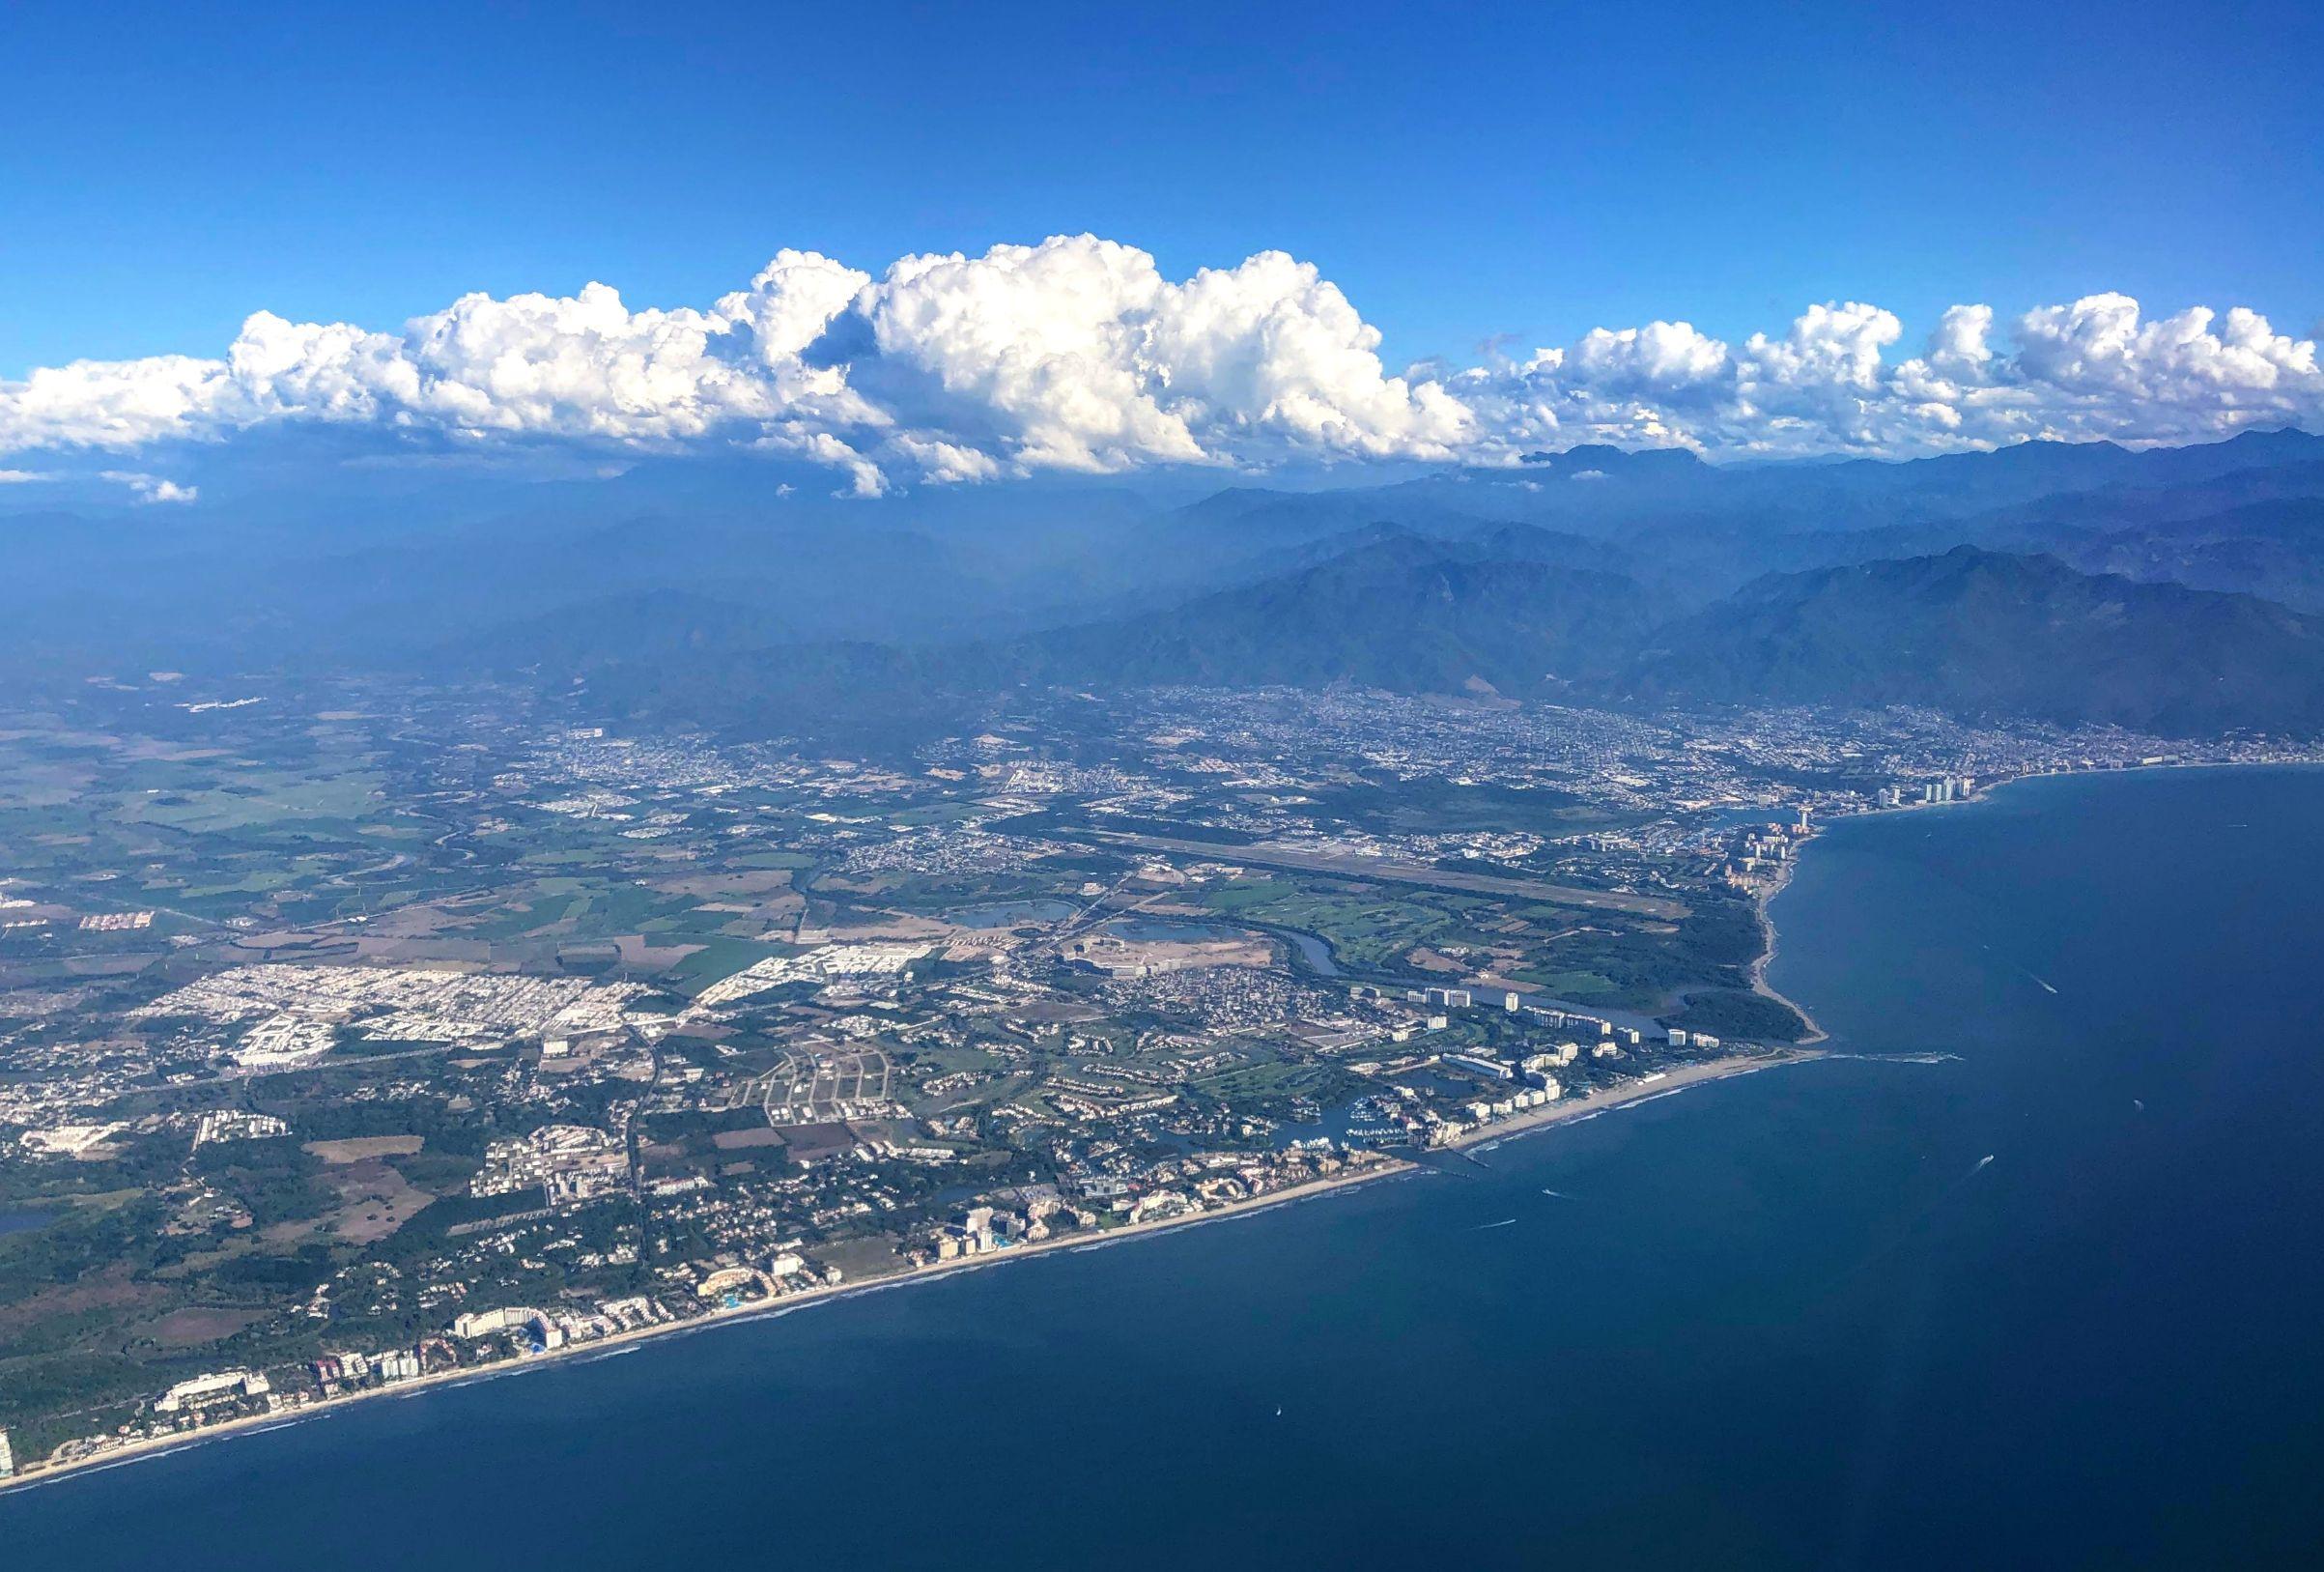 aerial view of Puerto Vallarta coast line